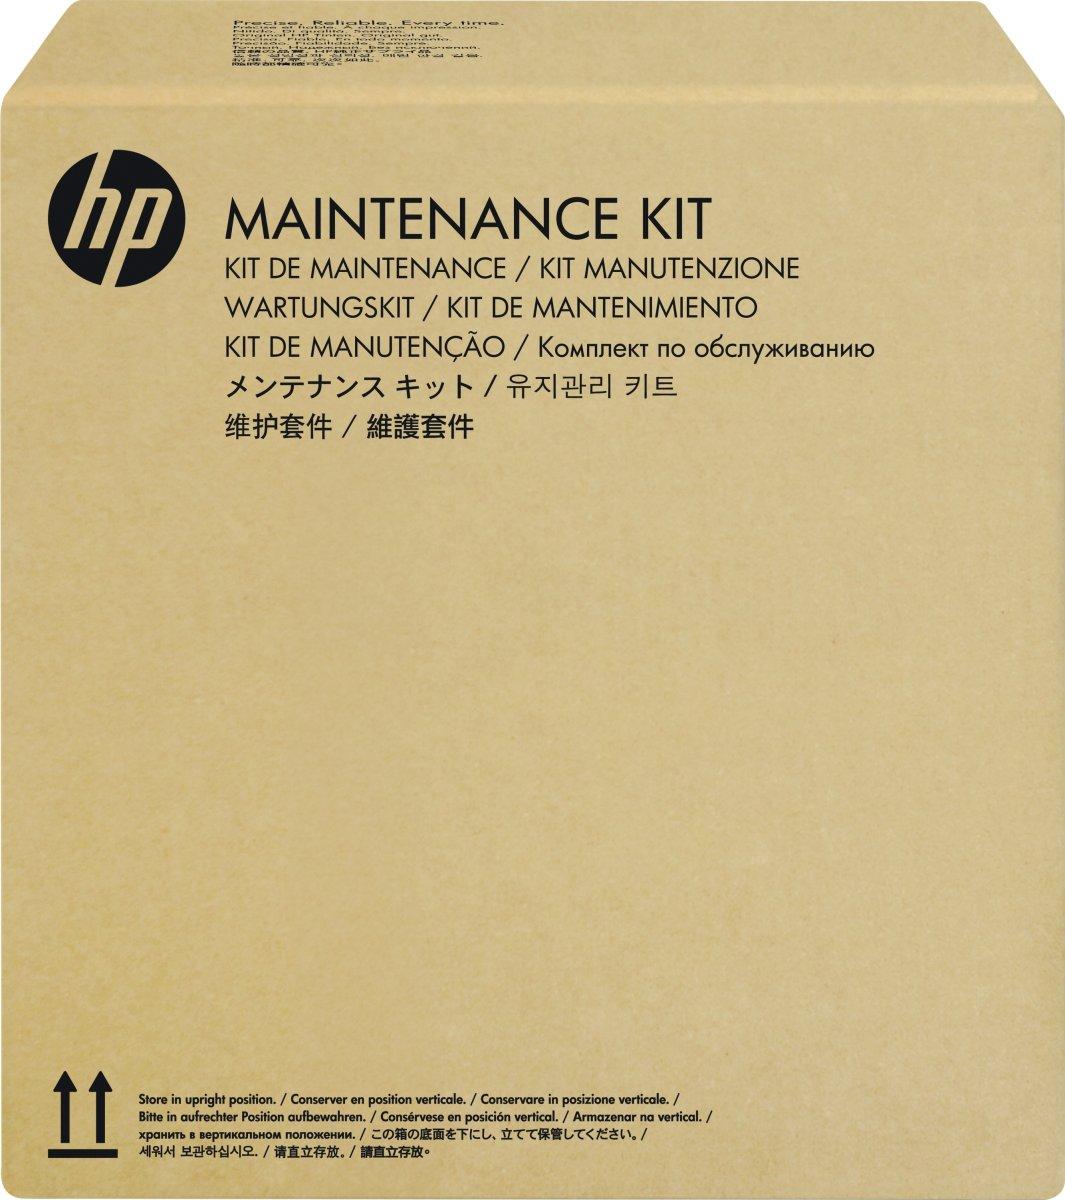 LaserJet maintenance kit 220v